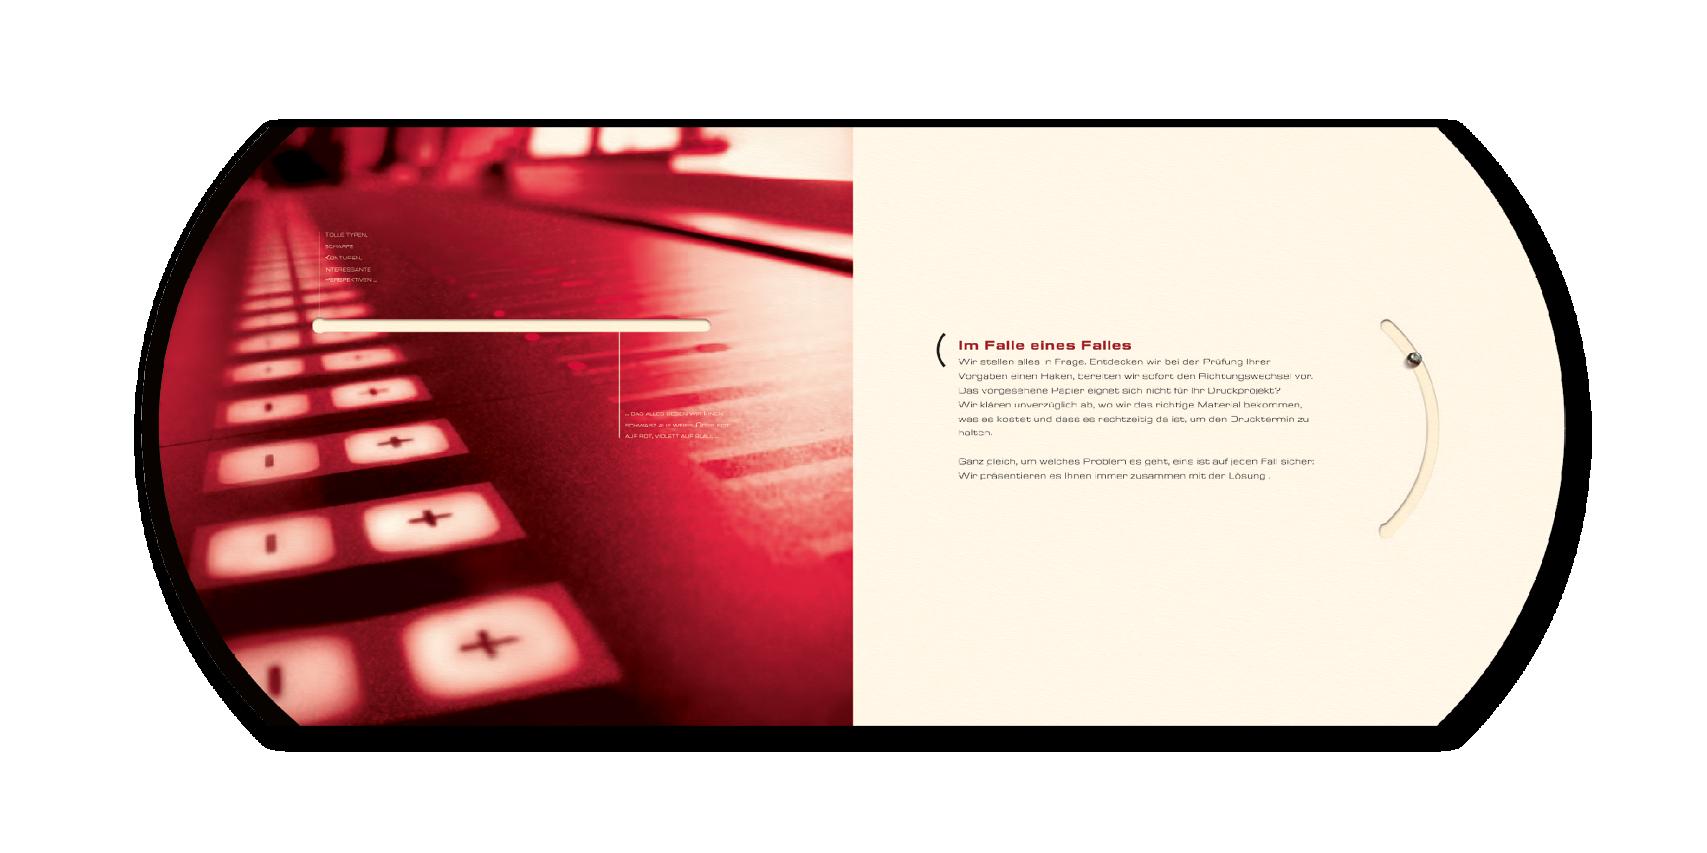 PQS-Imagebroschuere-4